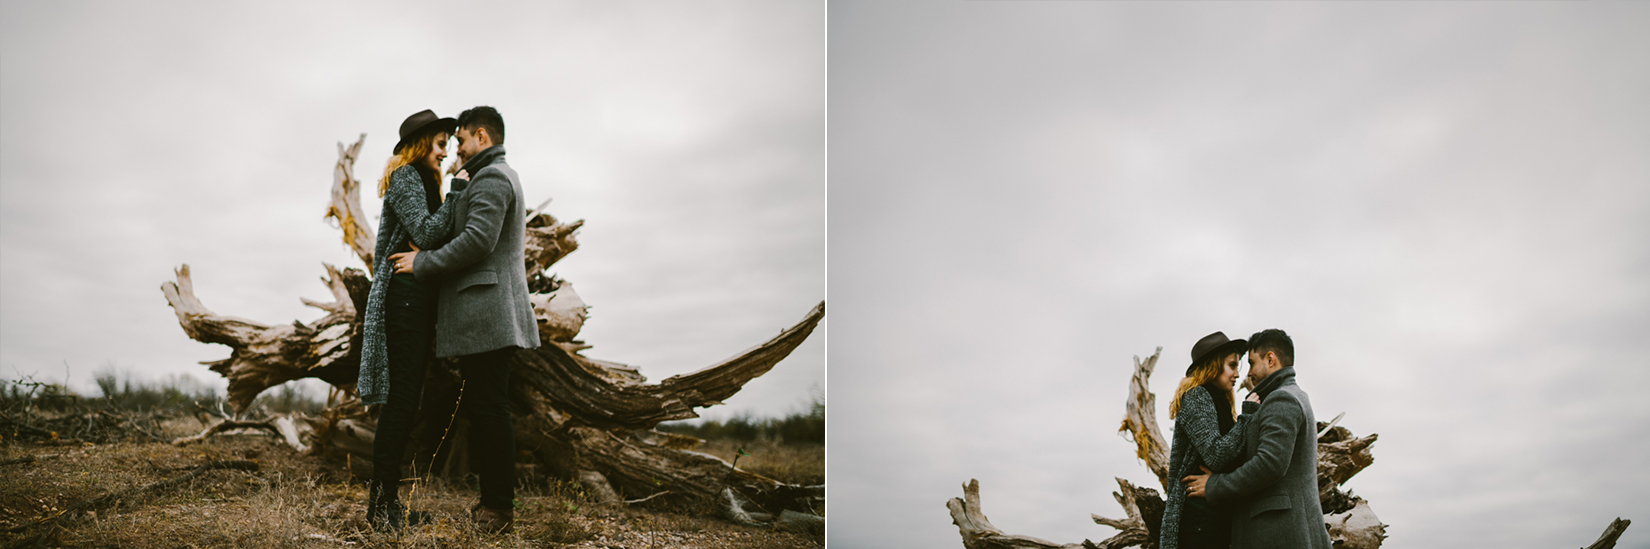 collage frida 4.jpg